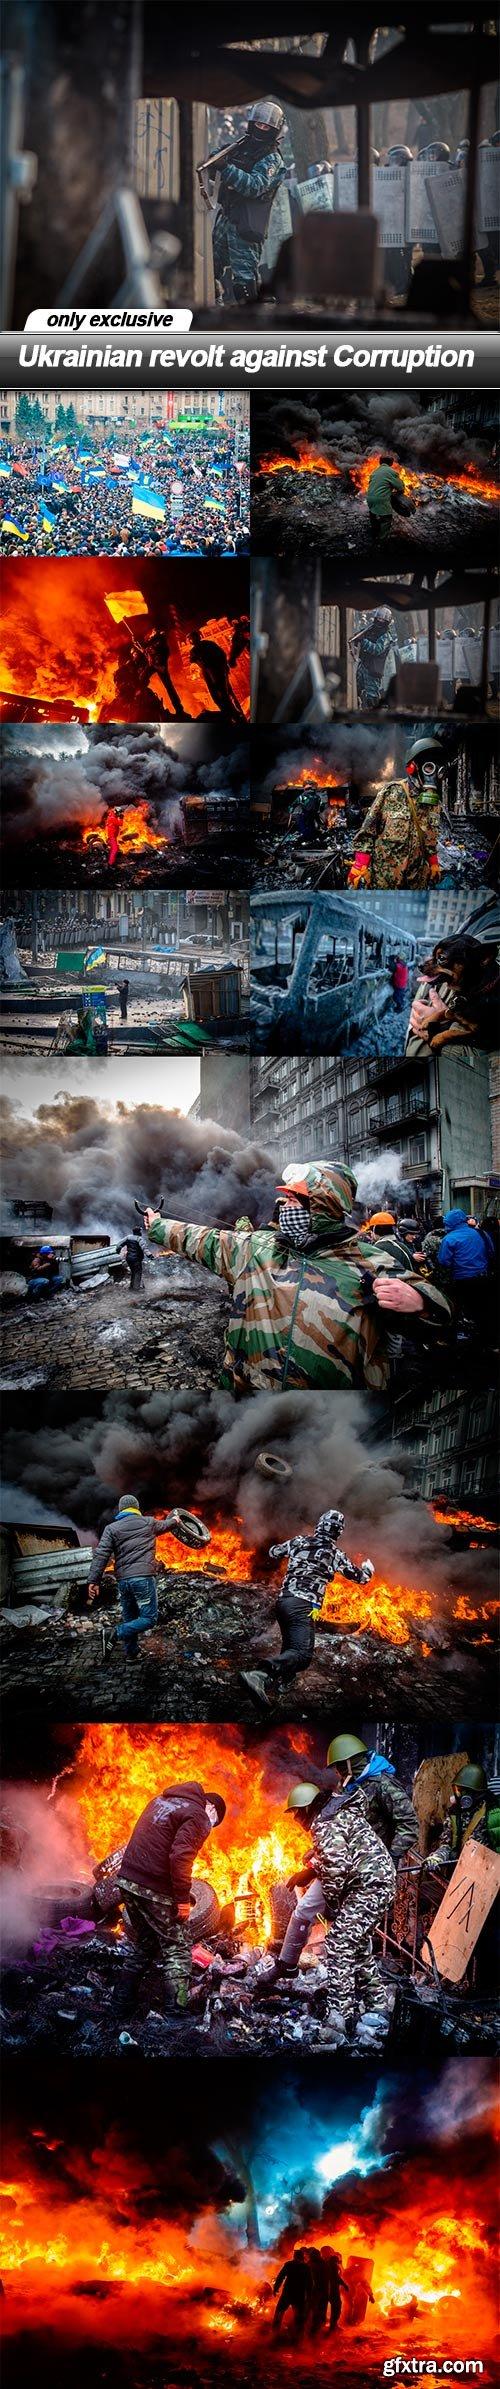 Ukrainian revolt against Corruption - 12 UHQ JPEG